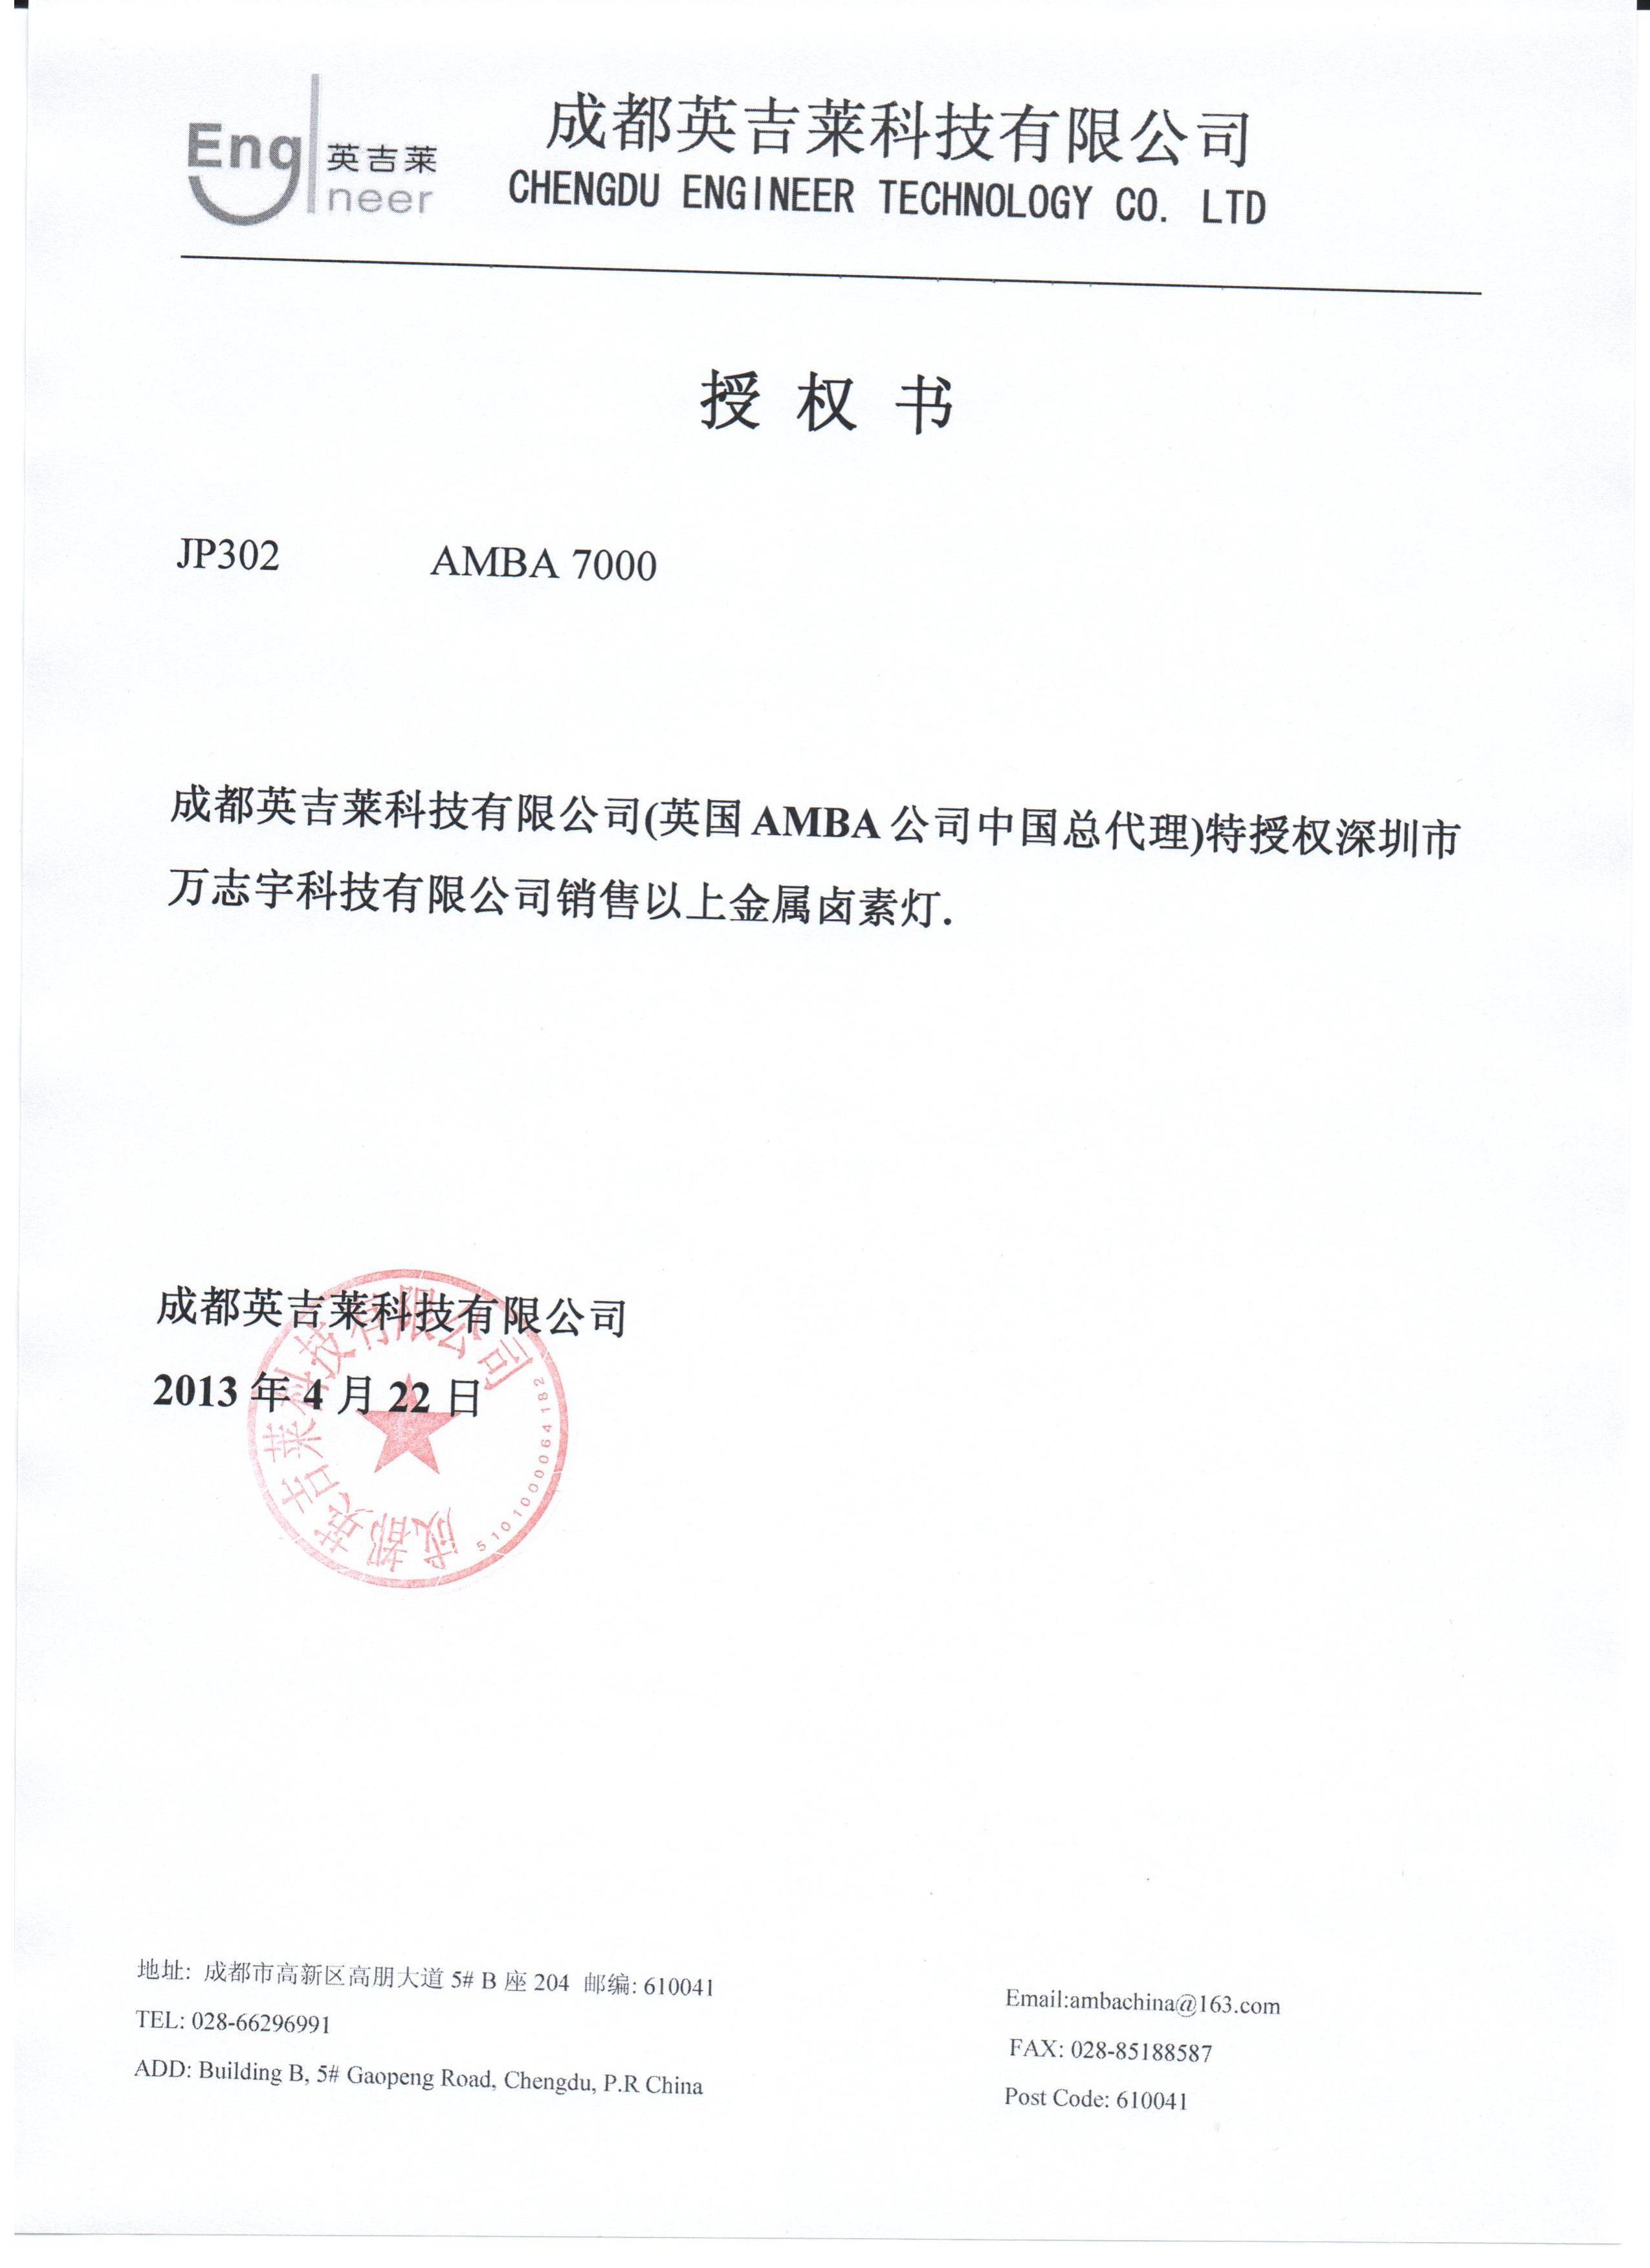 AMBA中文授权书